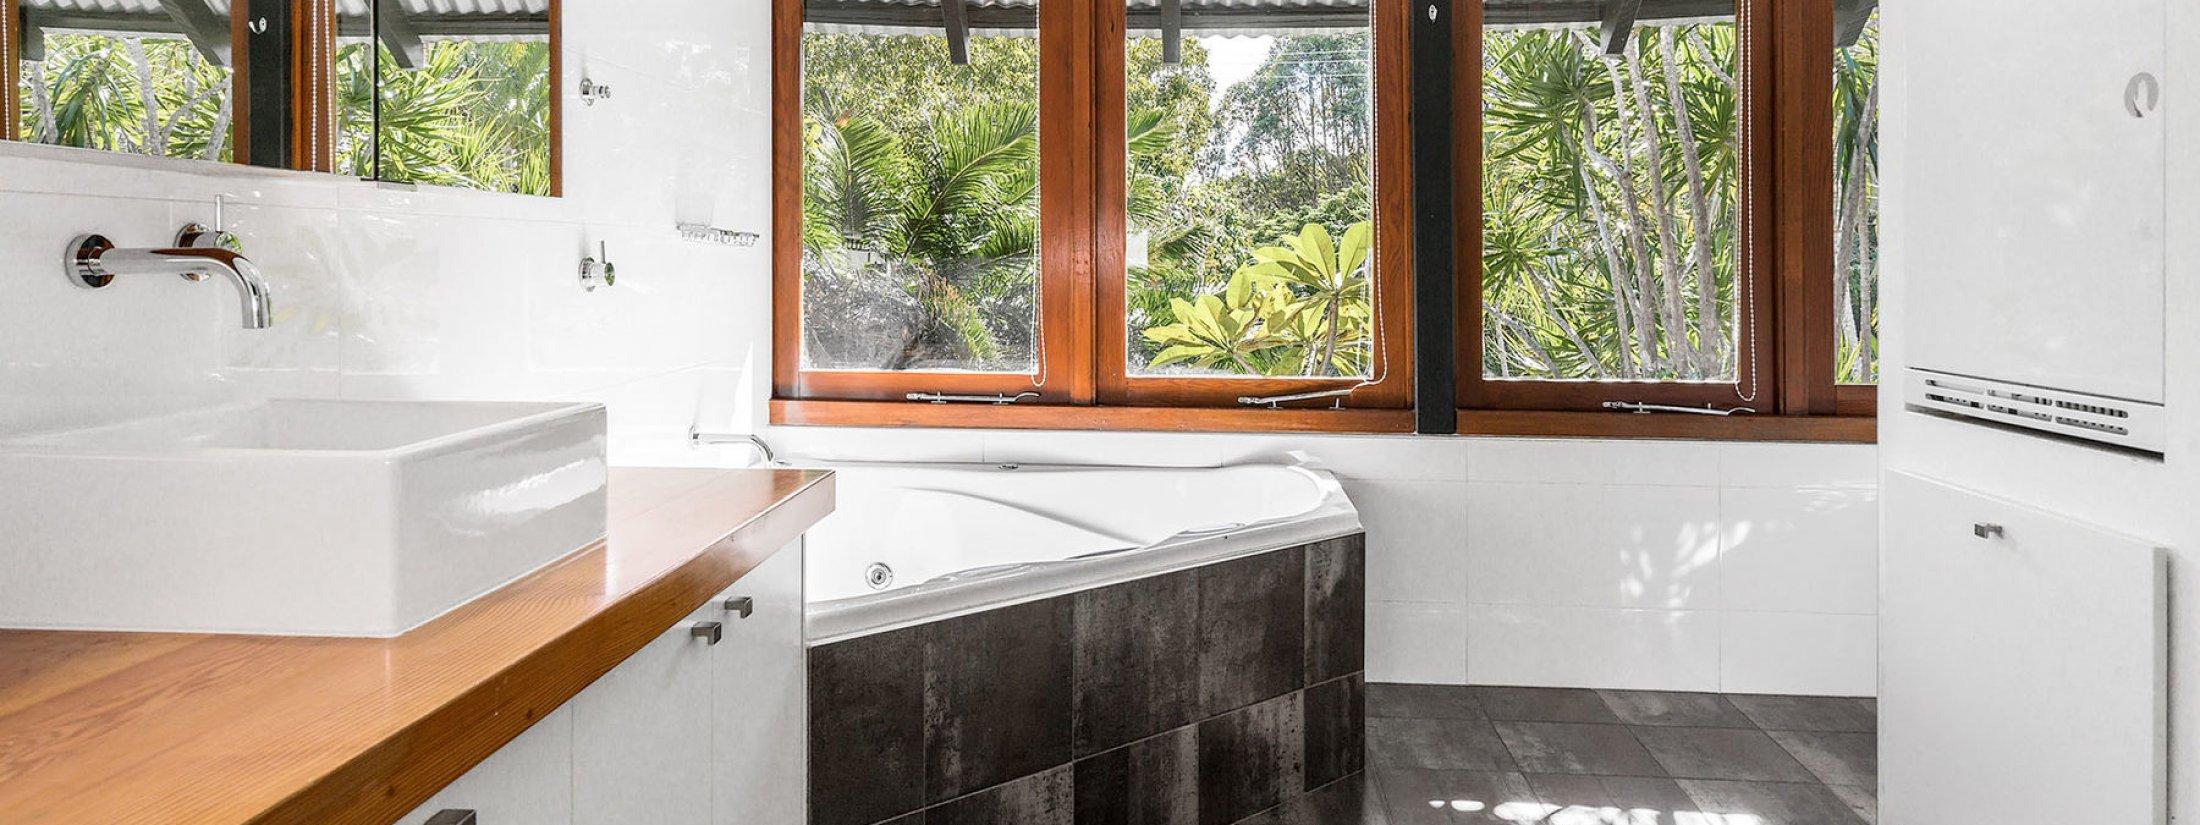 Ourmuli - Byron Bay - Shared Bathroom and Laundry b